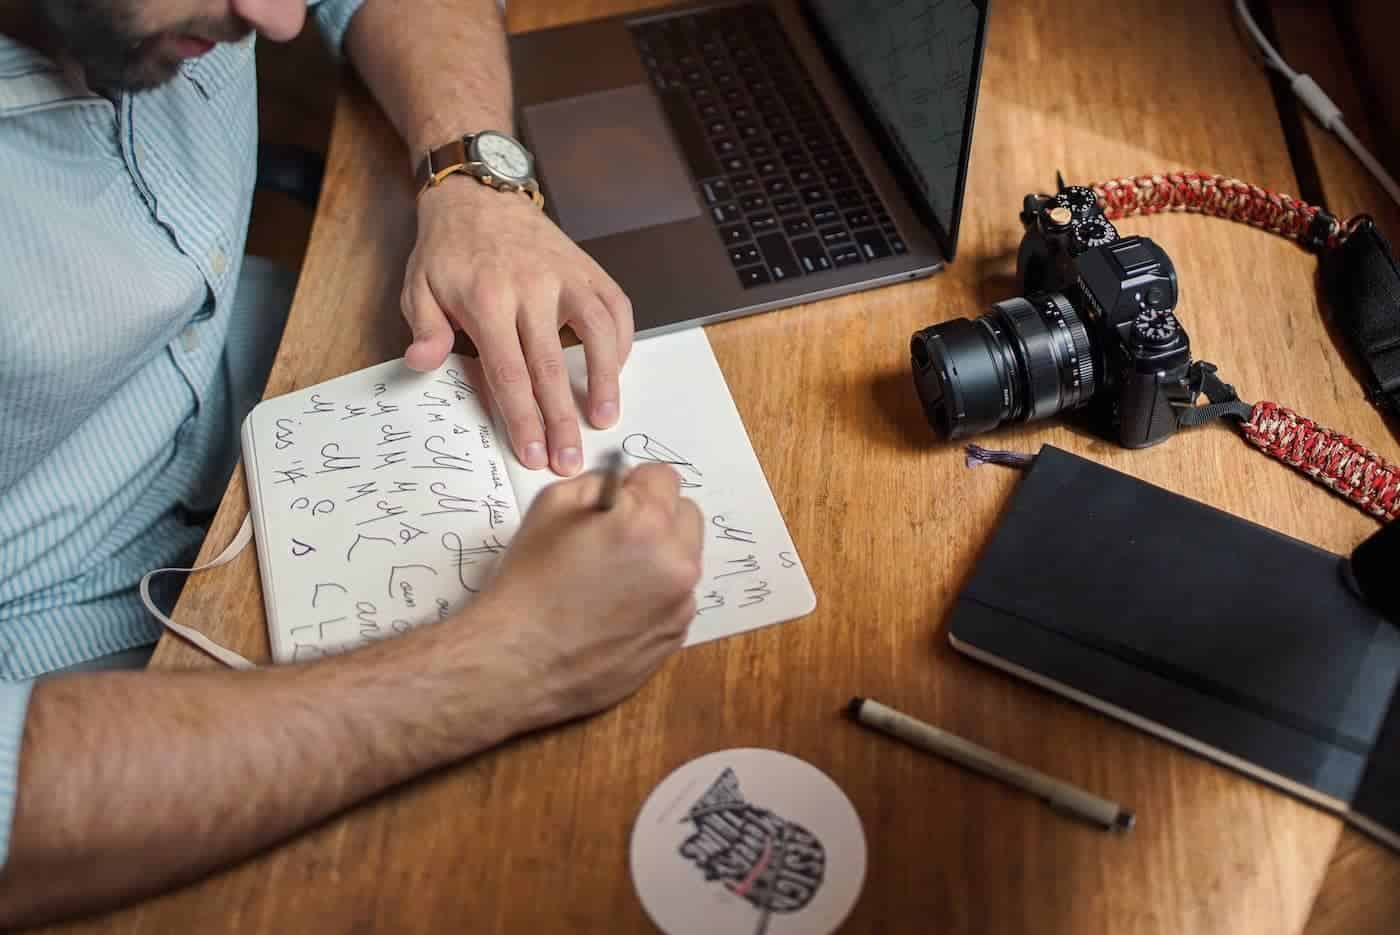 Man Creating a Brand Identity